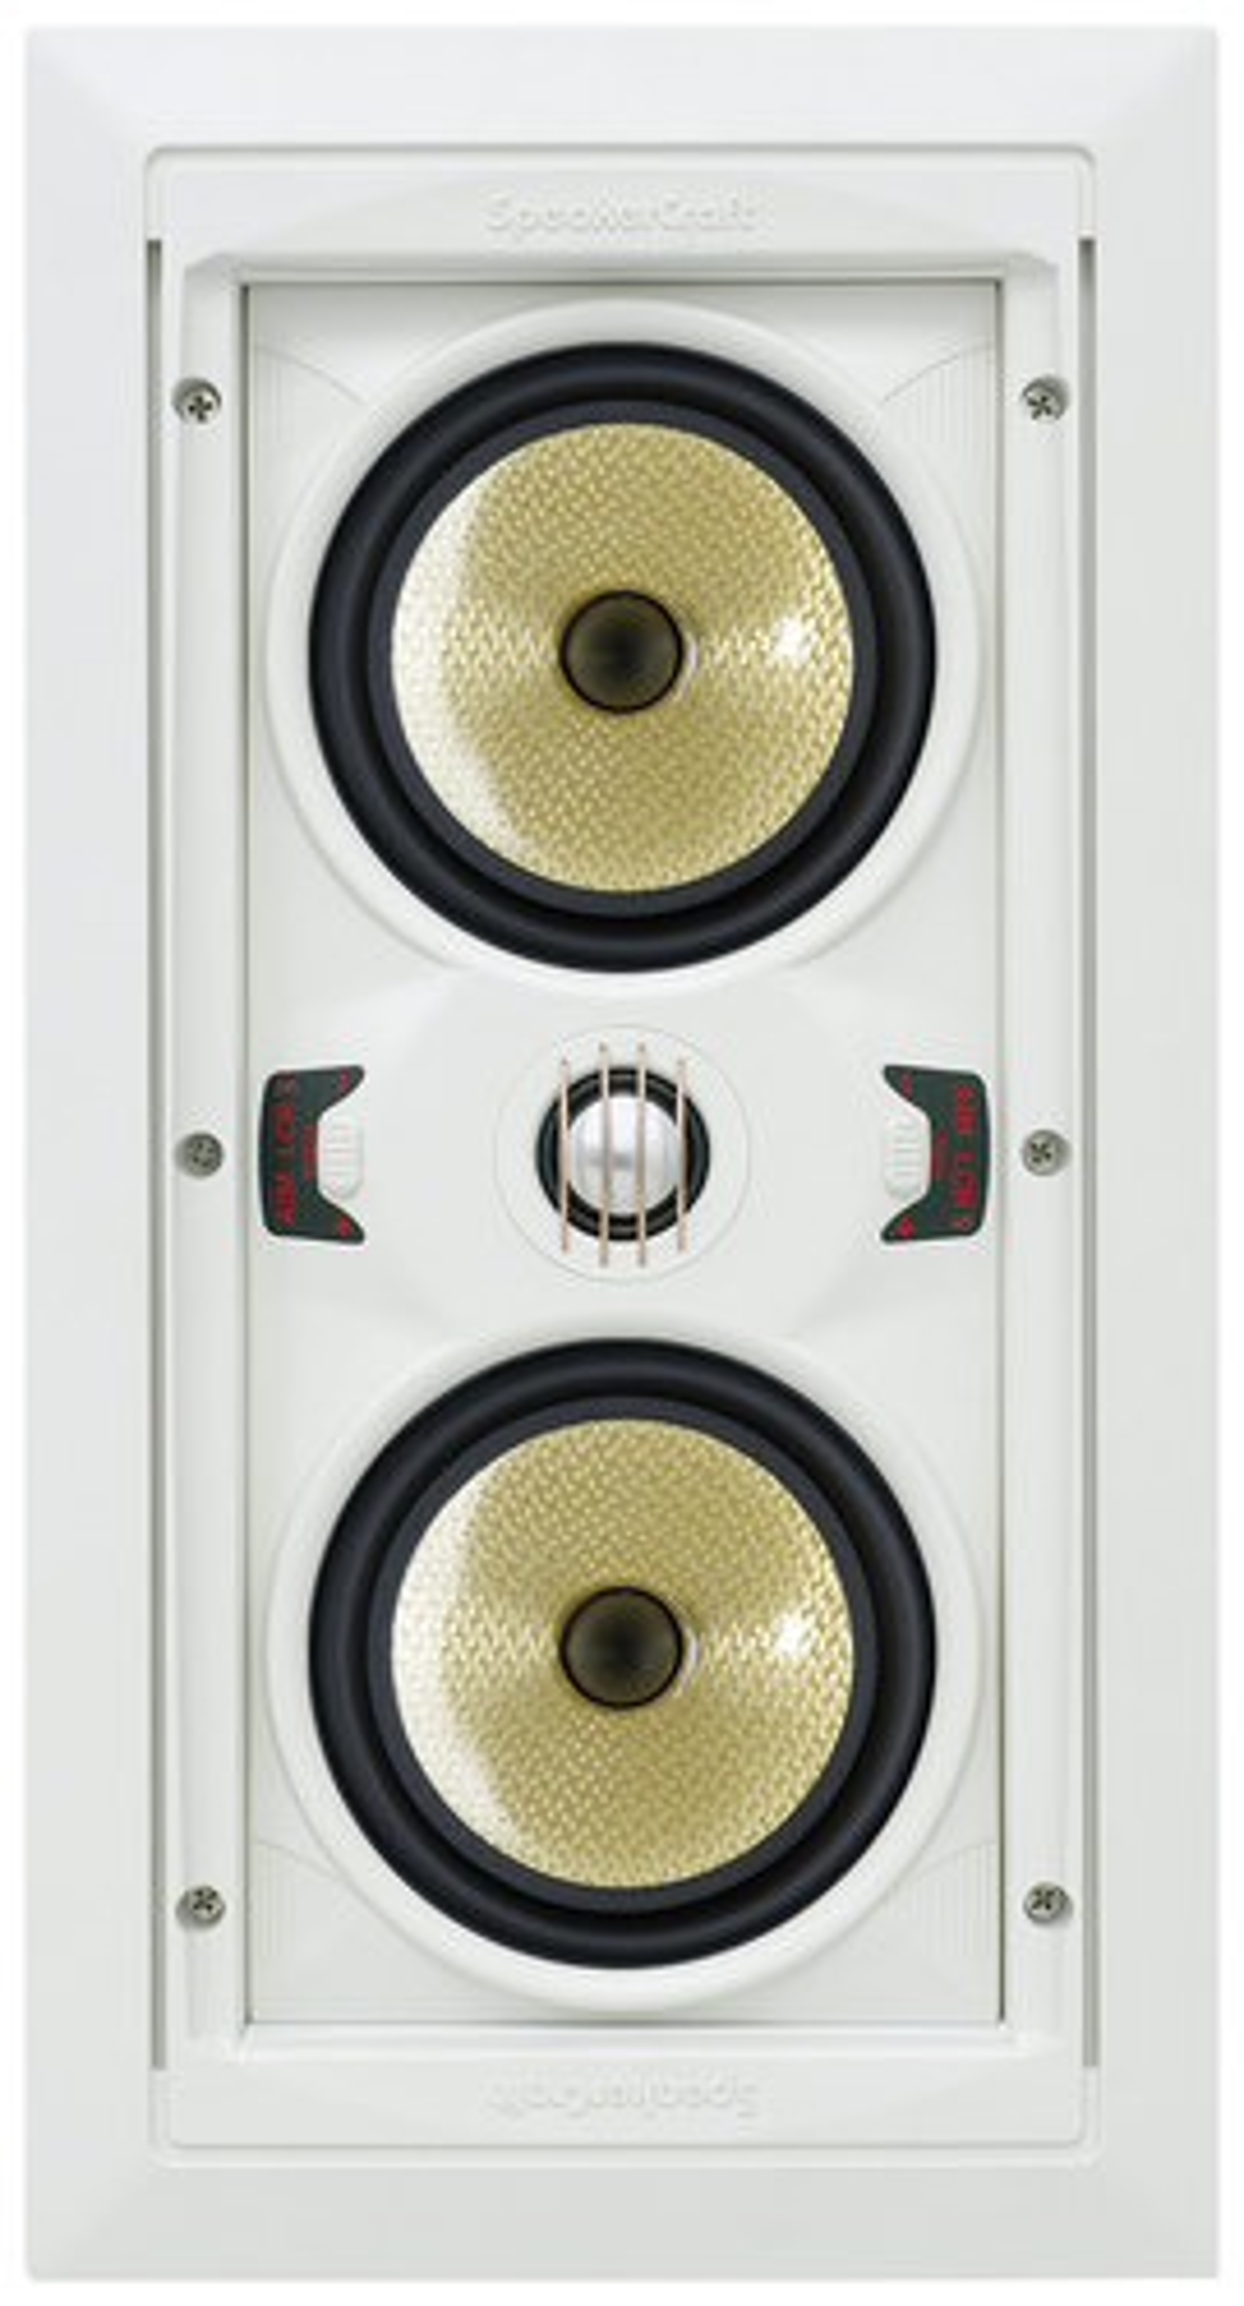 "SpeakerCraft - AIM LCR 5 Dual 5-1/4"" In-Wall Speaker (Each) - Black"